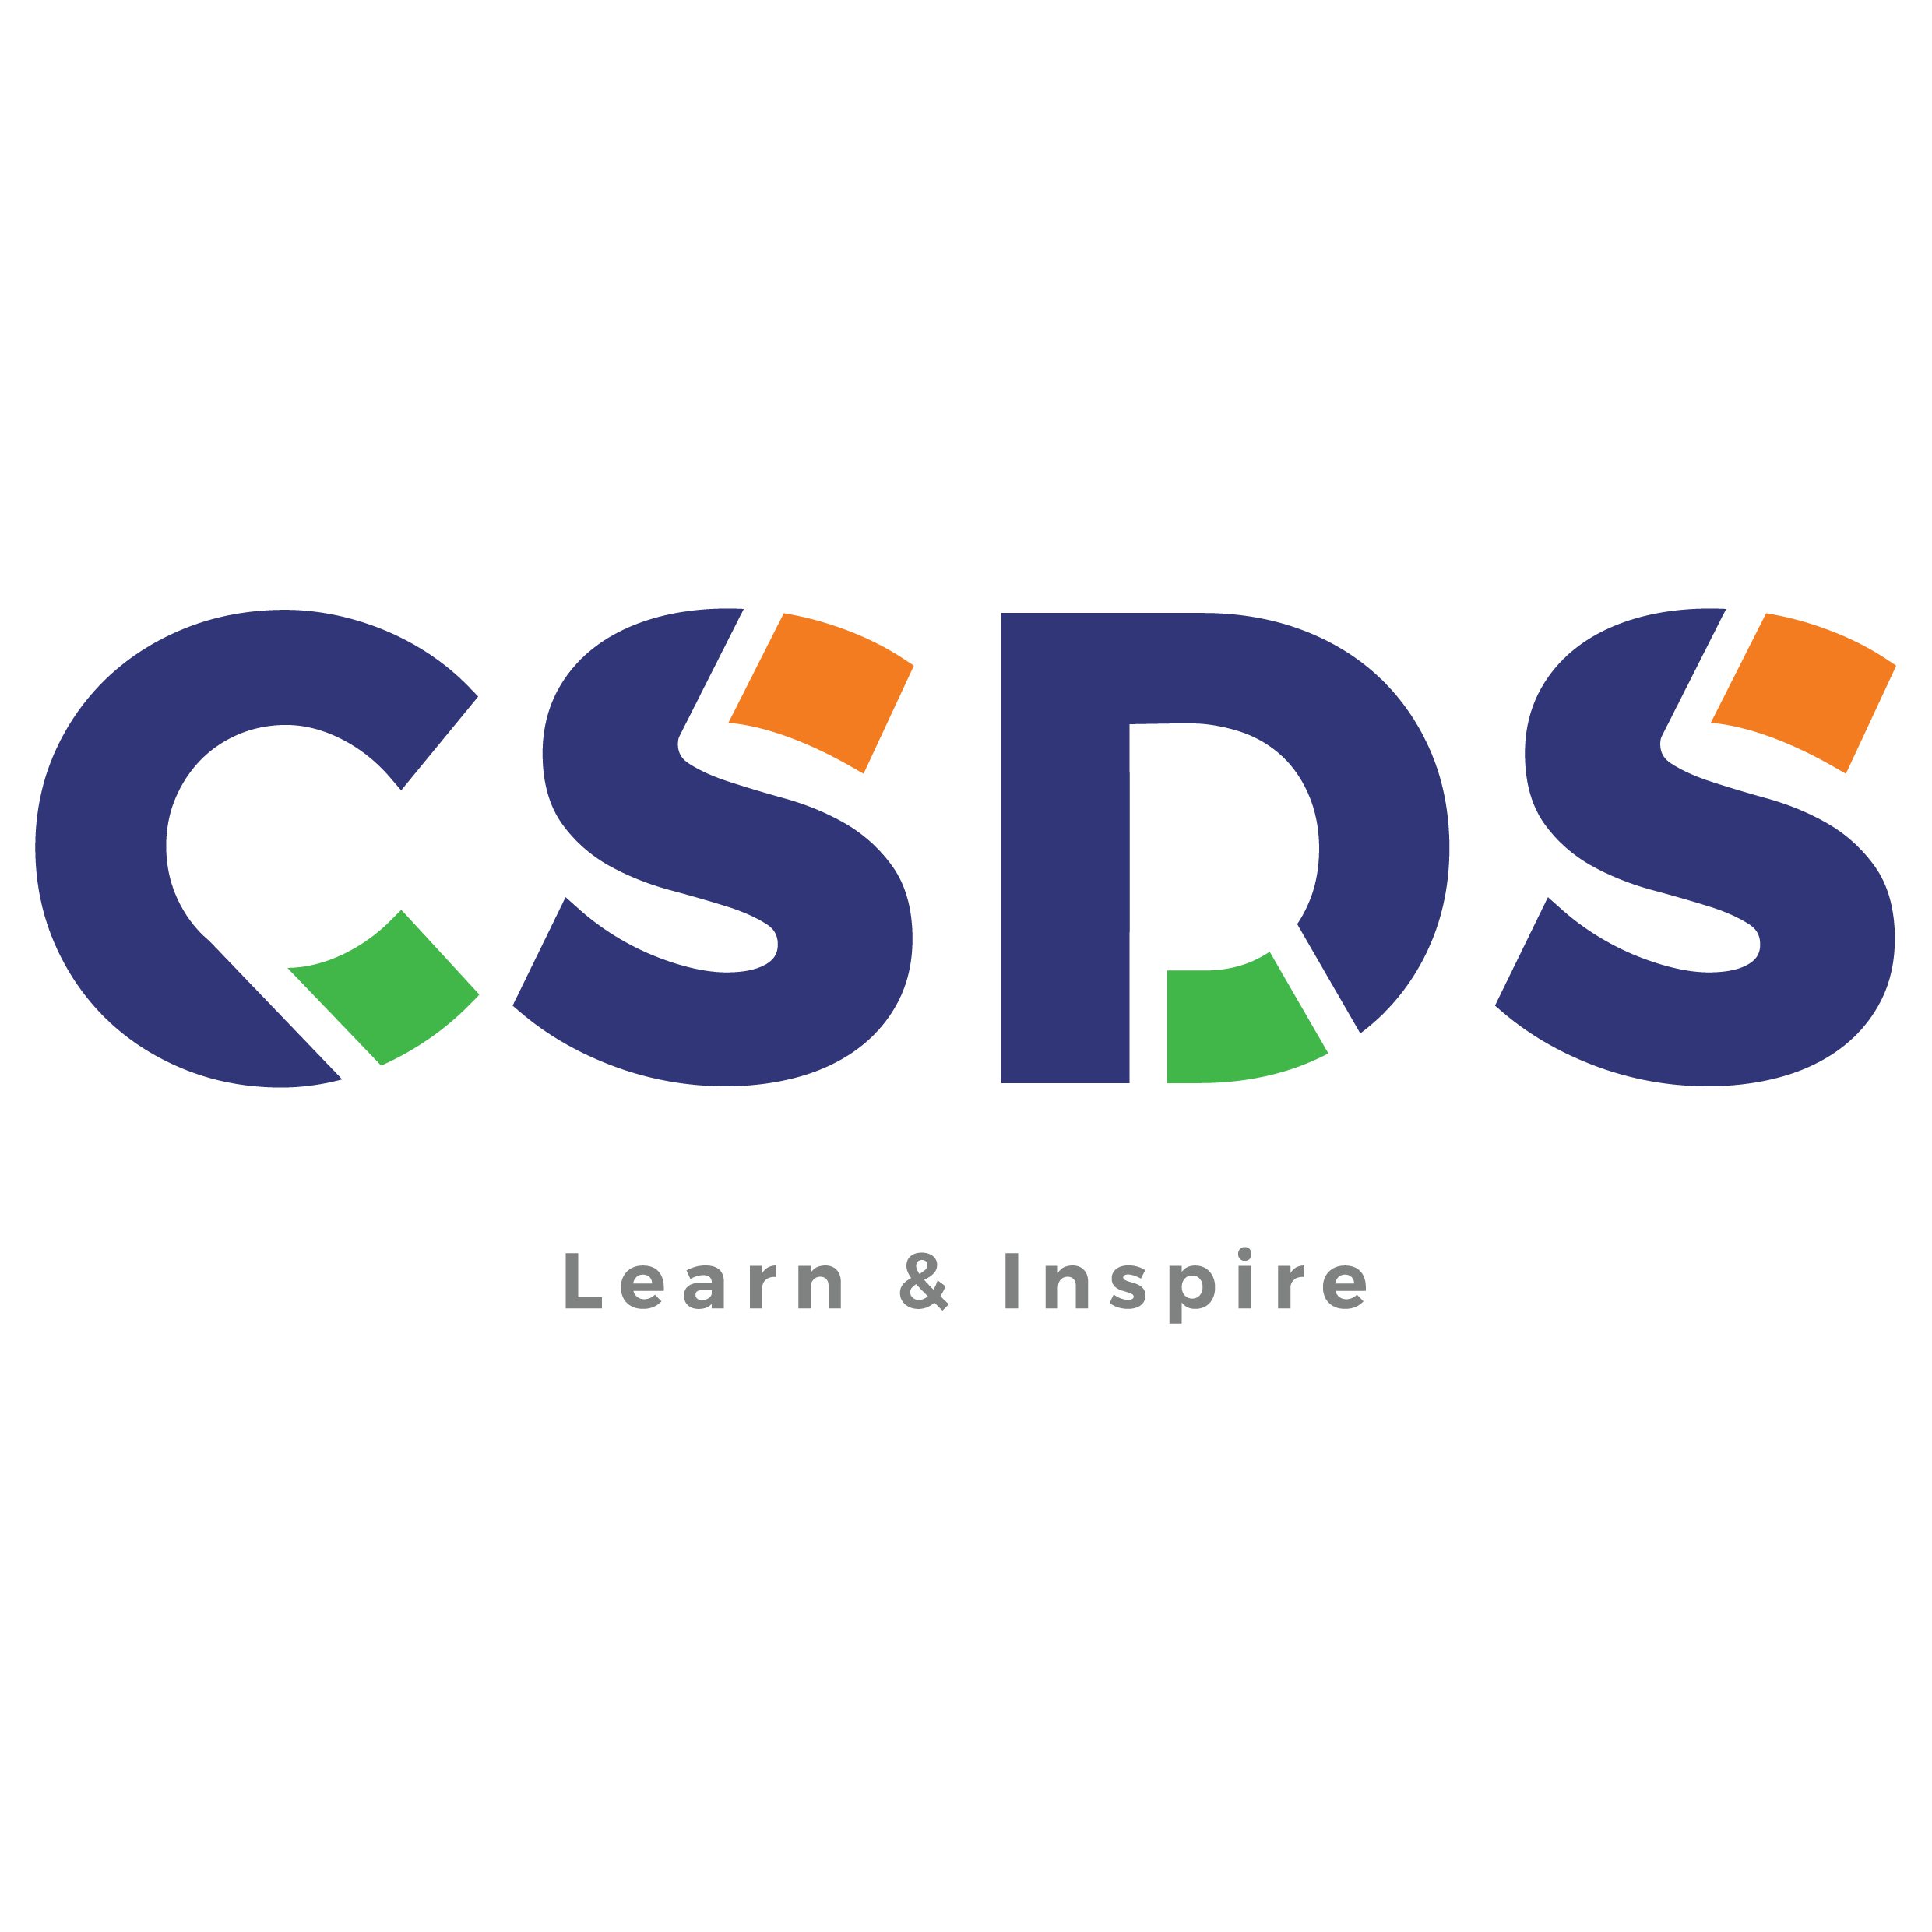 CSDS VN